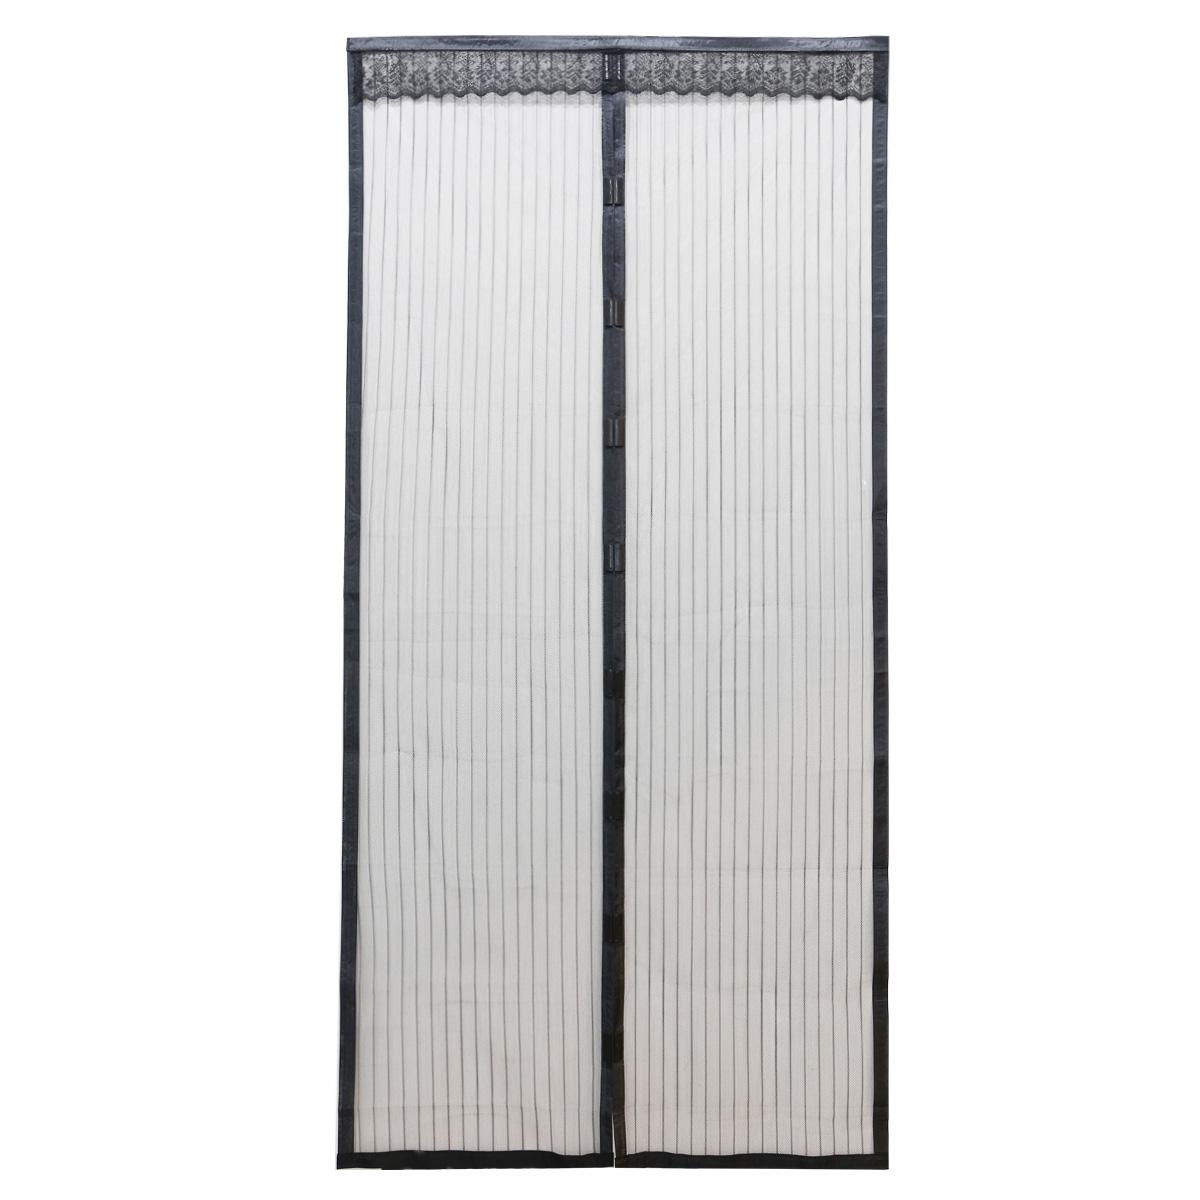 Cortina Mosquitera Velcro Magn Tica 100x210cm Negro Stripe